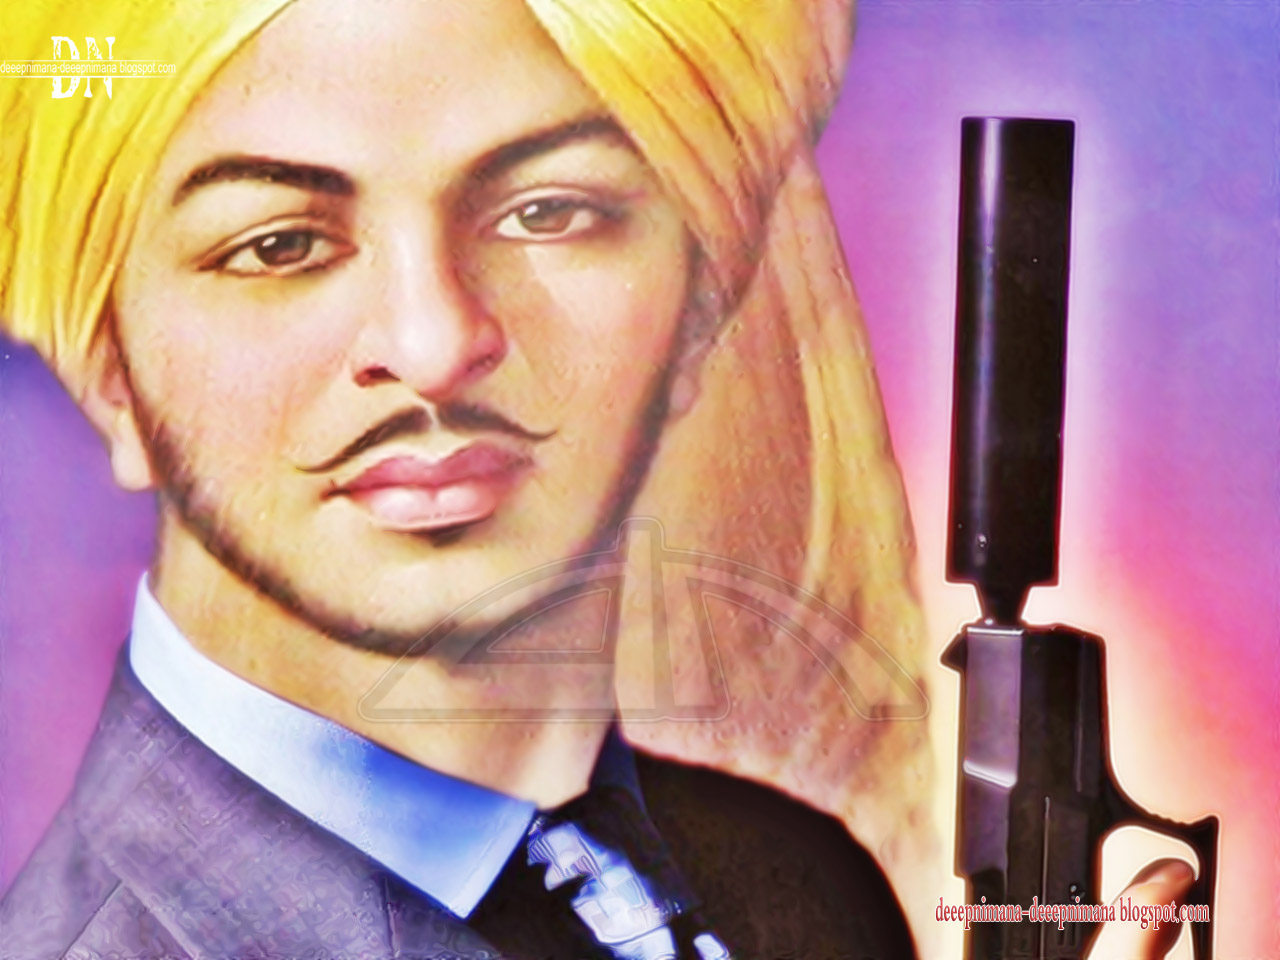 deeepnimana-deeepnimana blogspot.com: bhagat singh